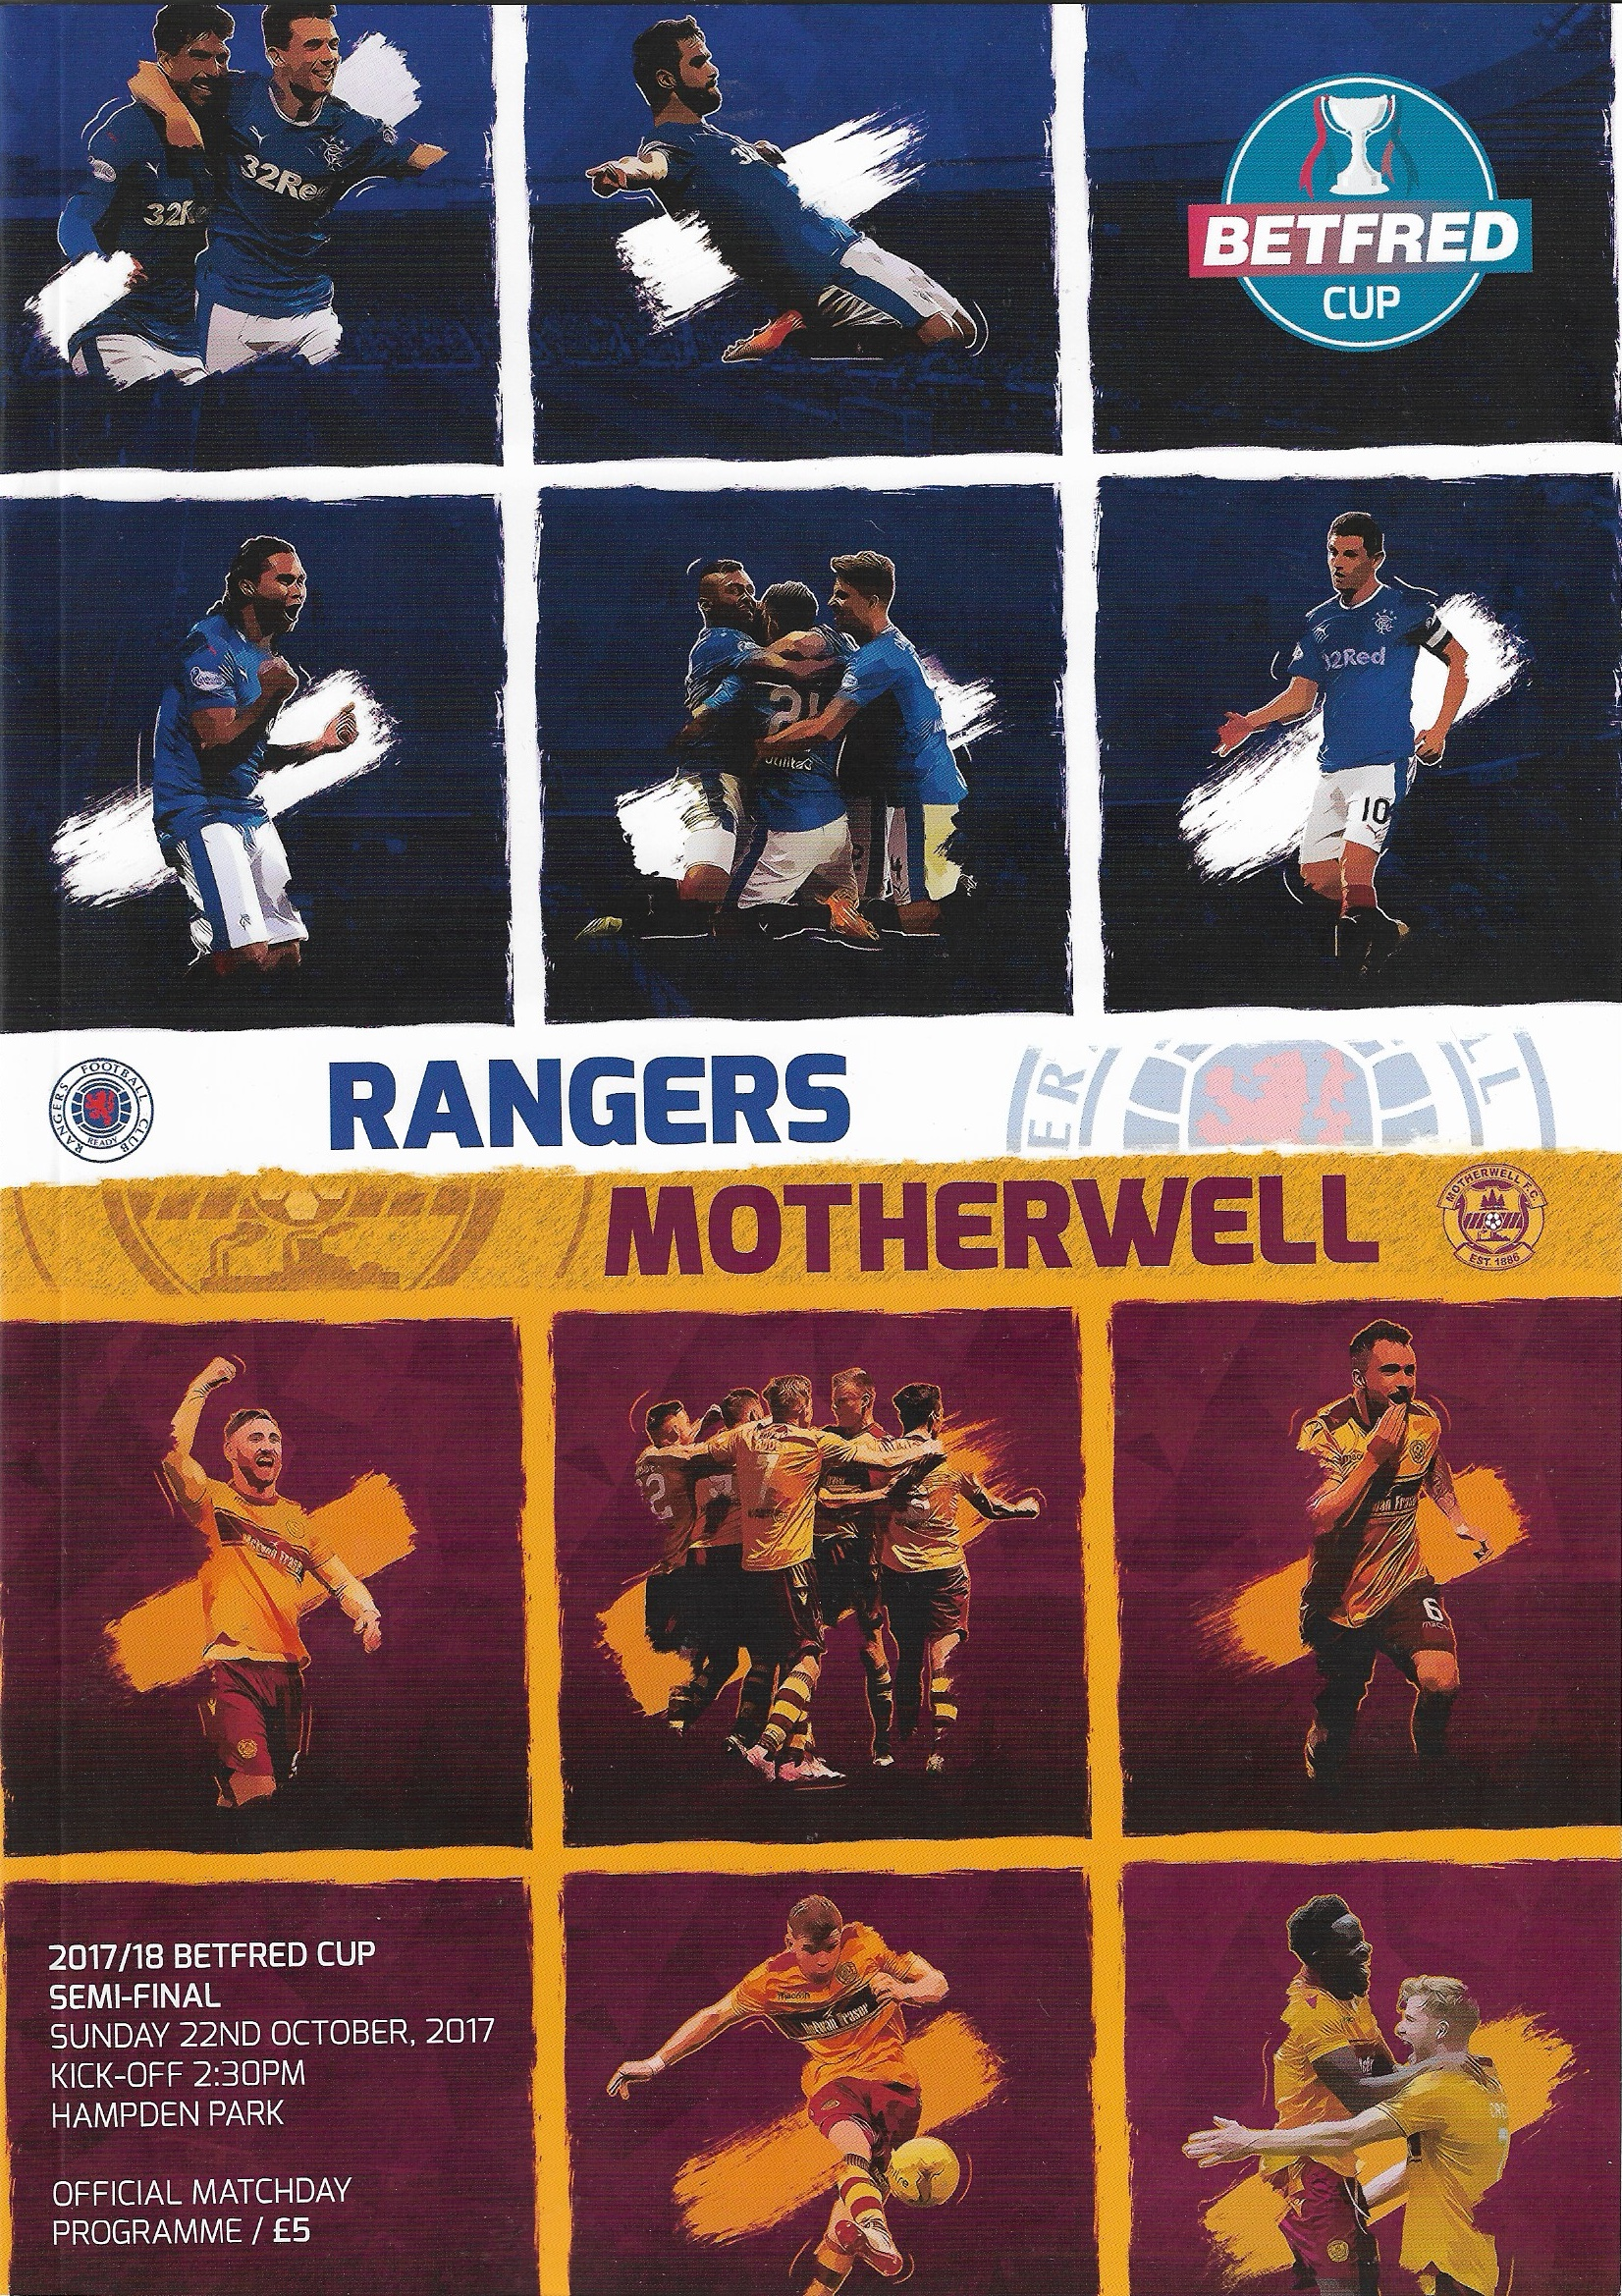 League Cup Semi-Final Programme vs Rangers 2017/18